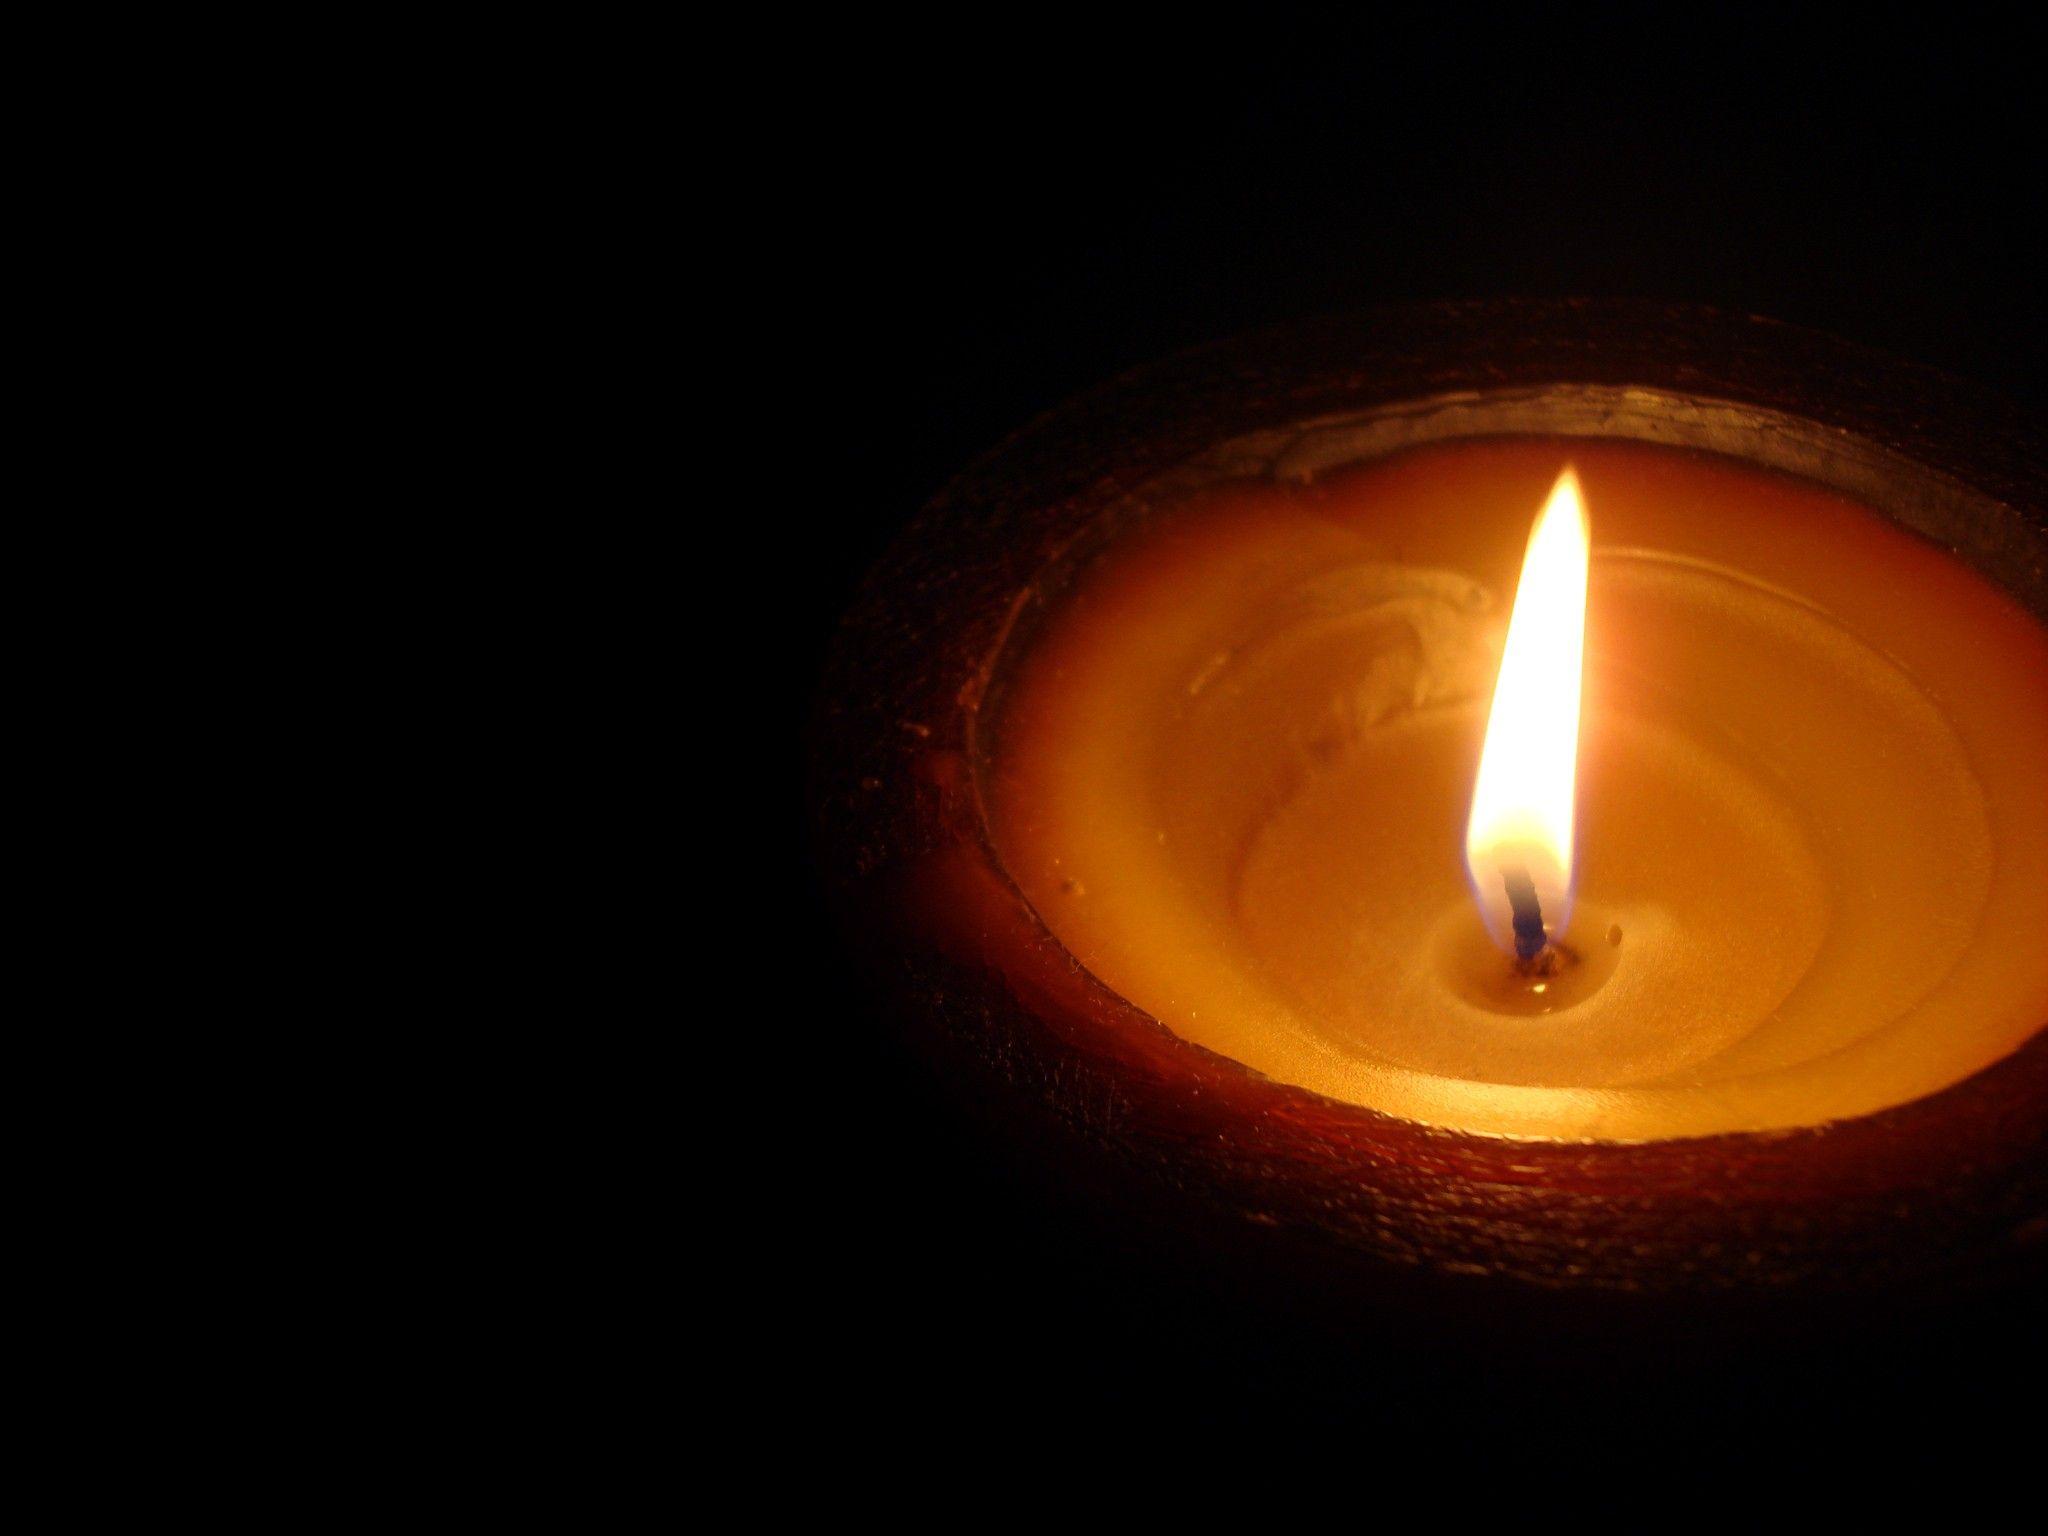 Diwali Candles Deepak Wallpaper Diwali Candles Candles Wallpaper Wallpaper candle close up flame dark